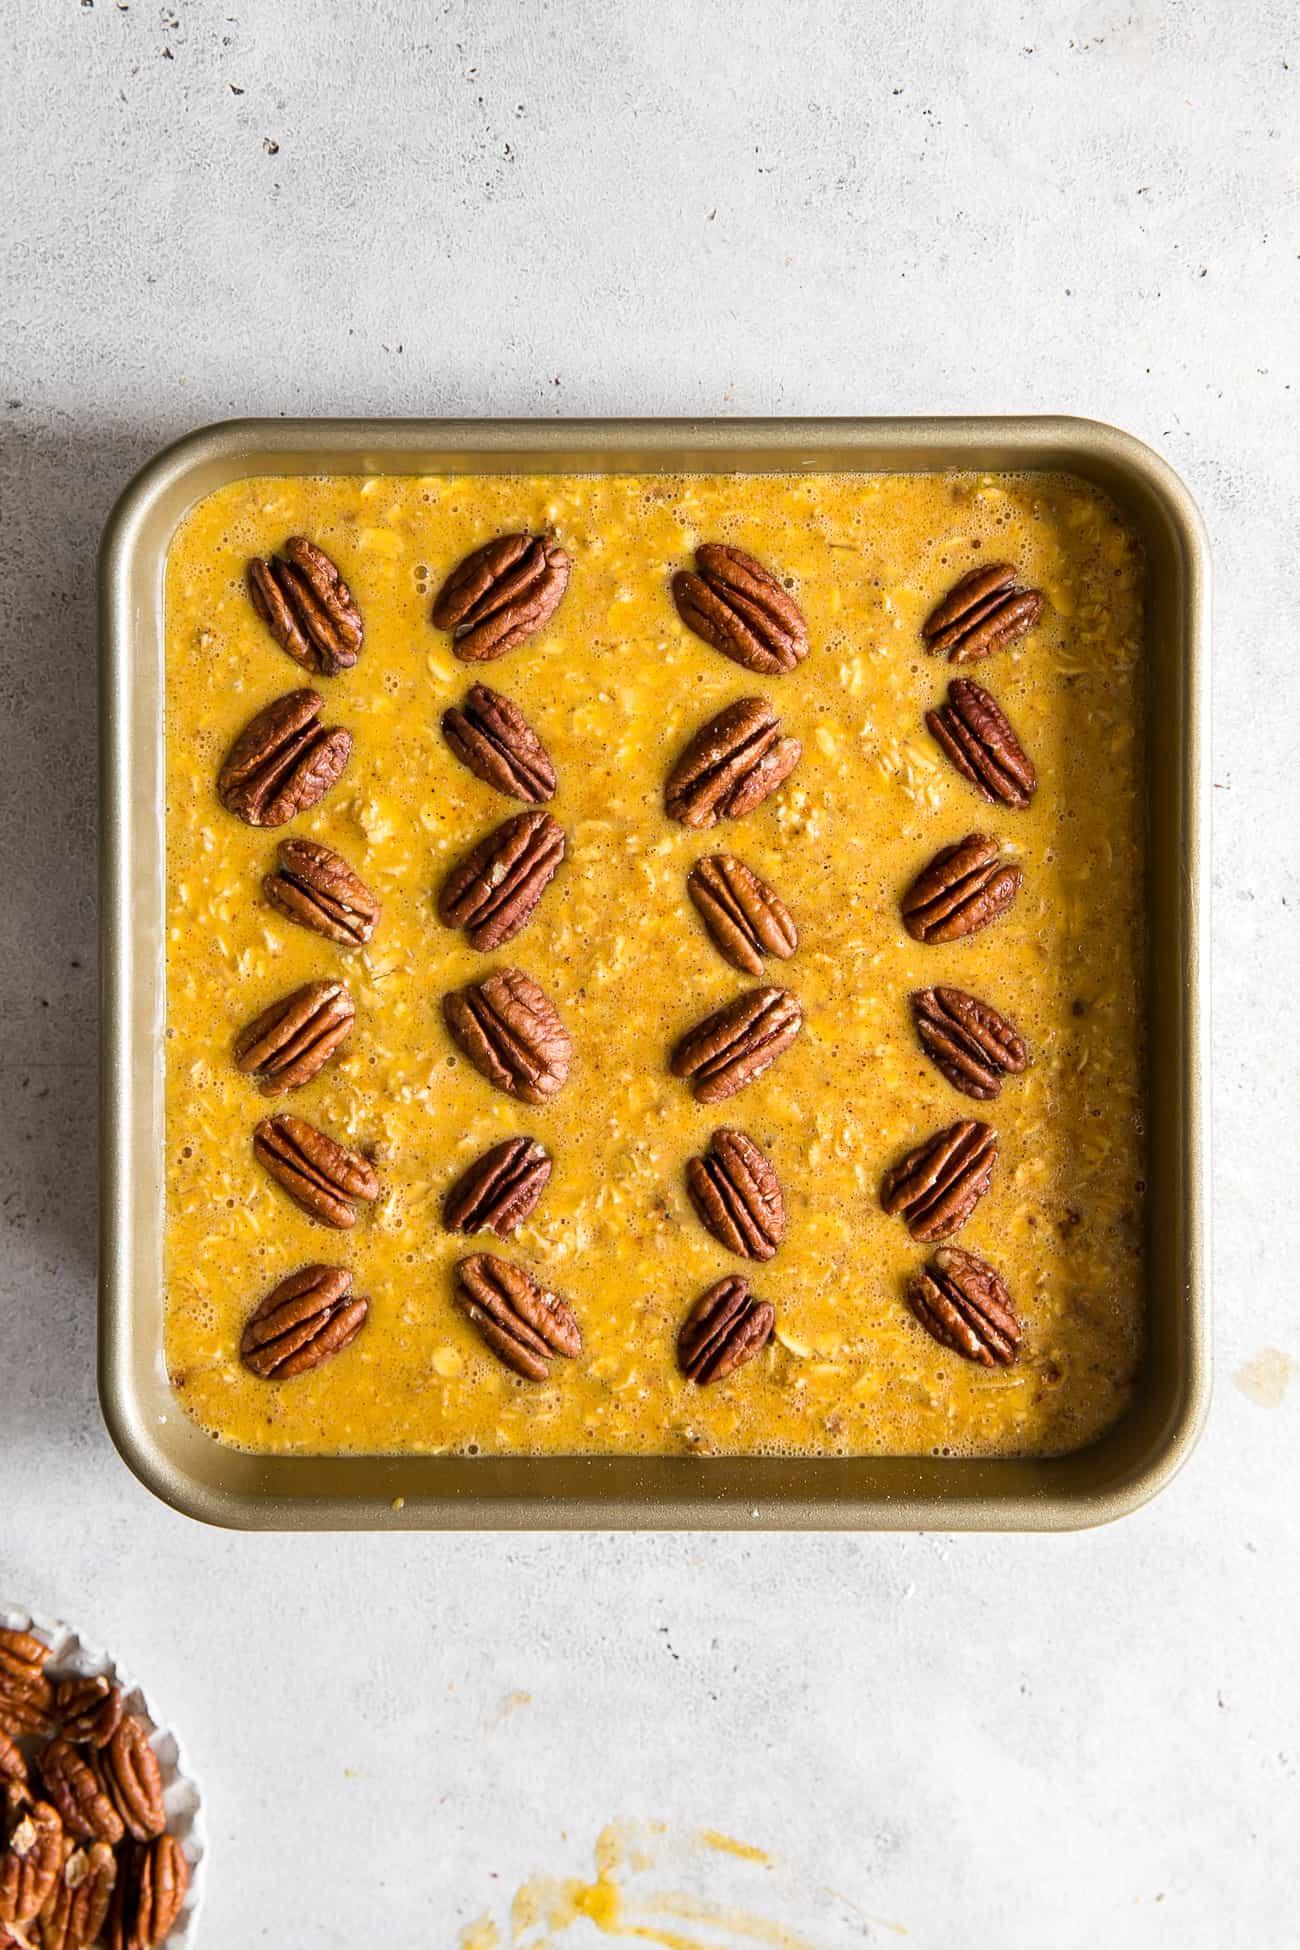 pumpkin oatmeal batter in square baking pan wit pecans arranged in pattern on top